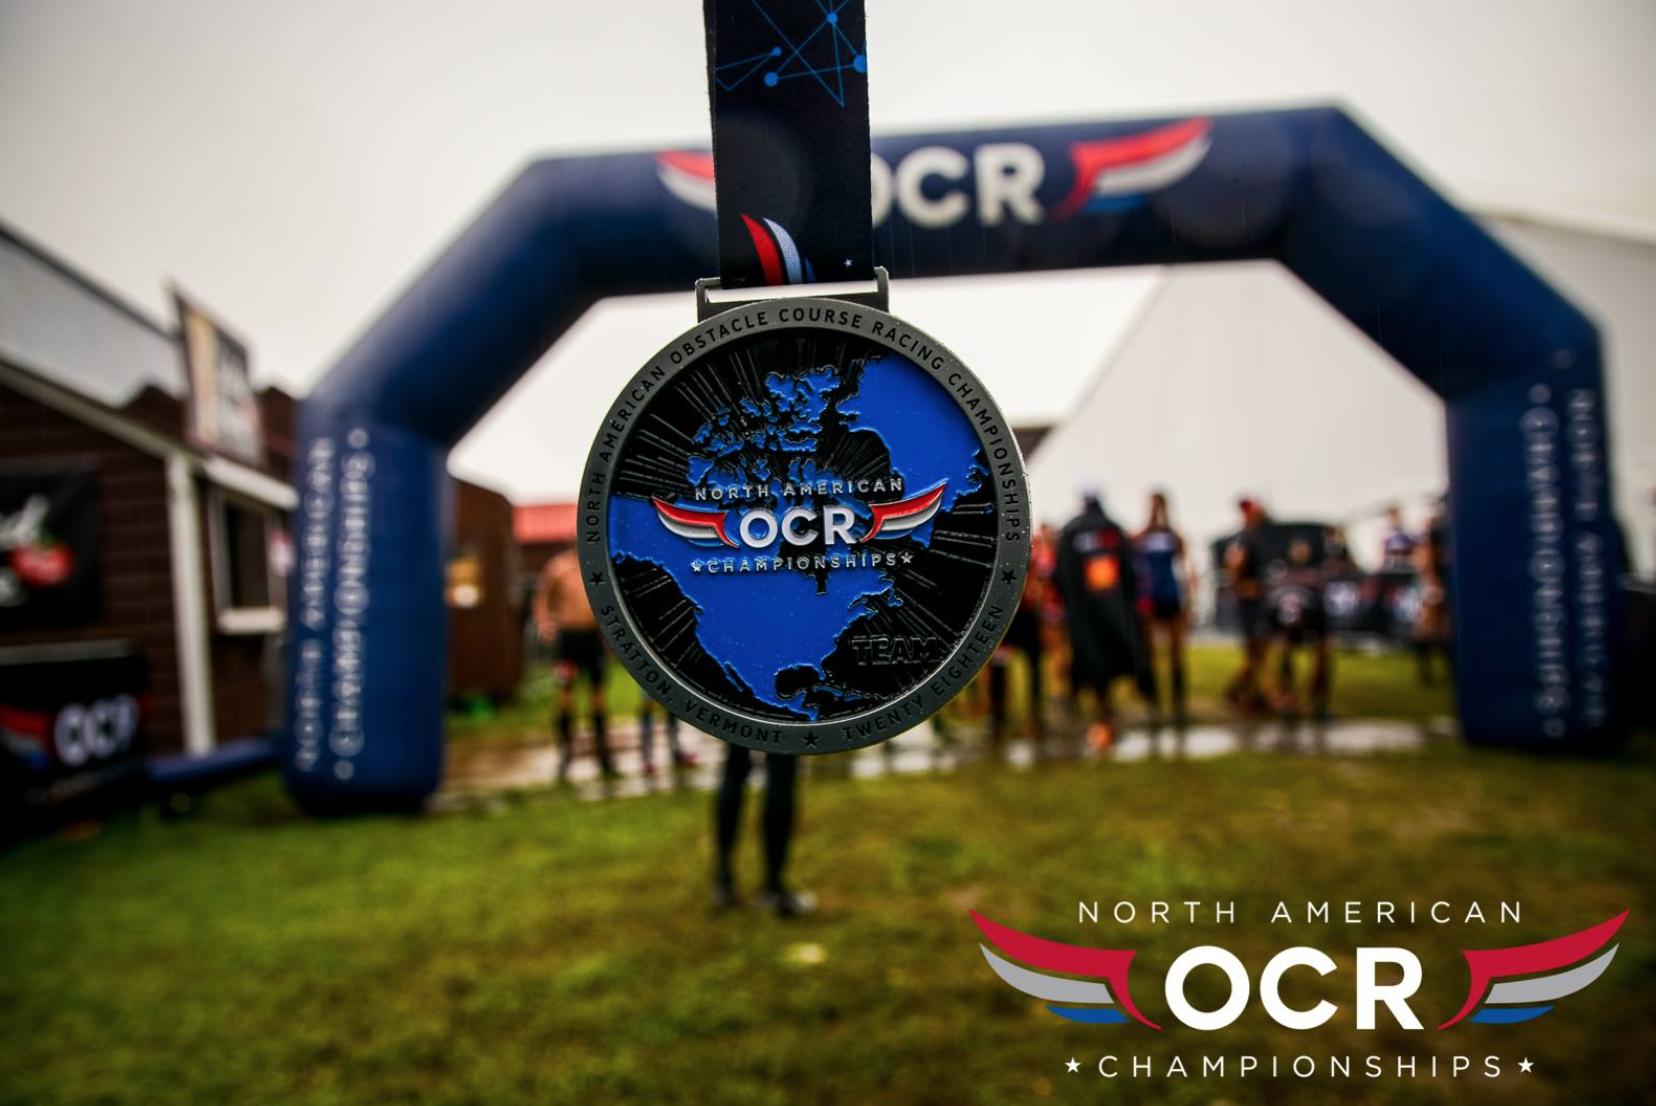 NORAM OCR Championships